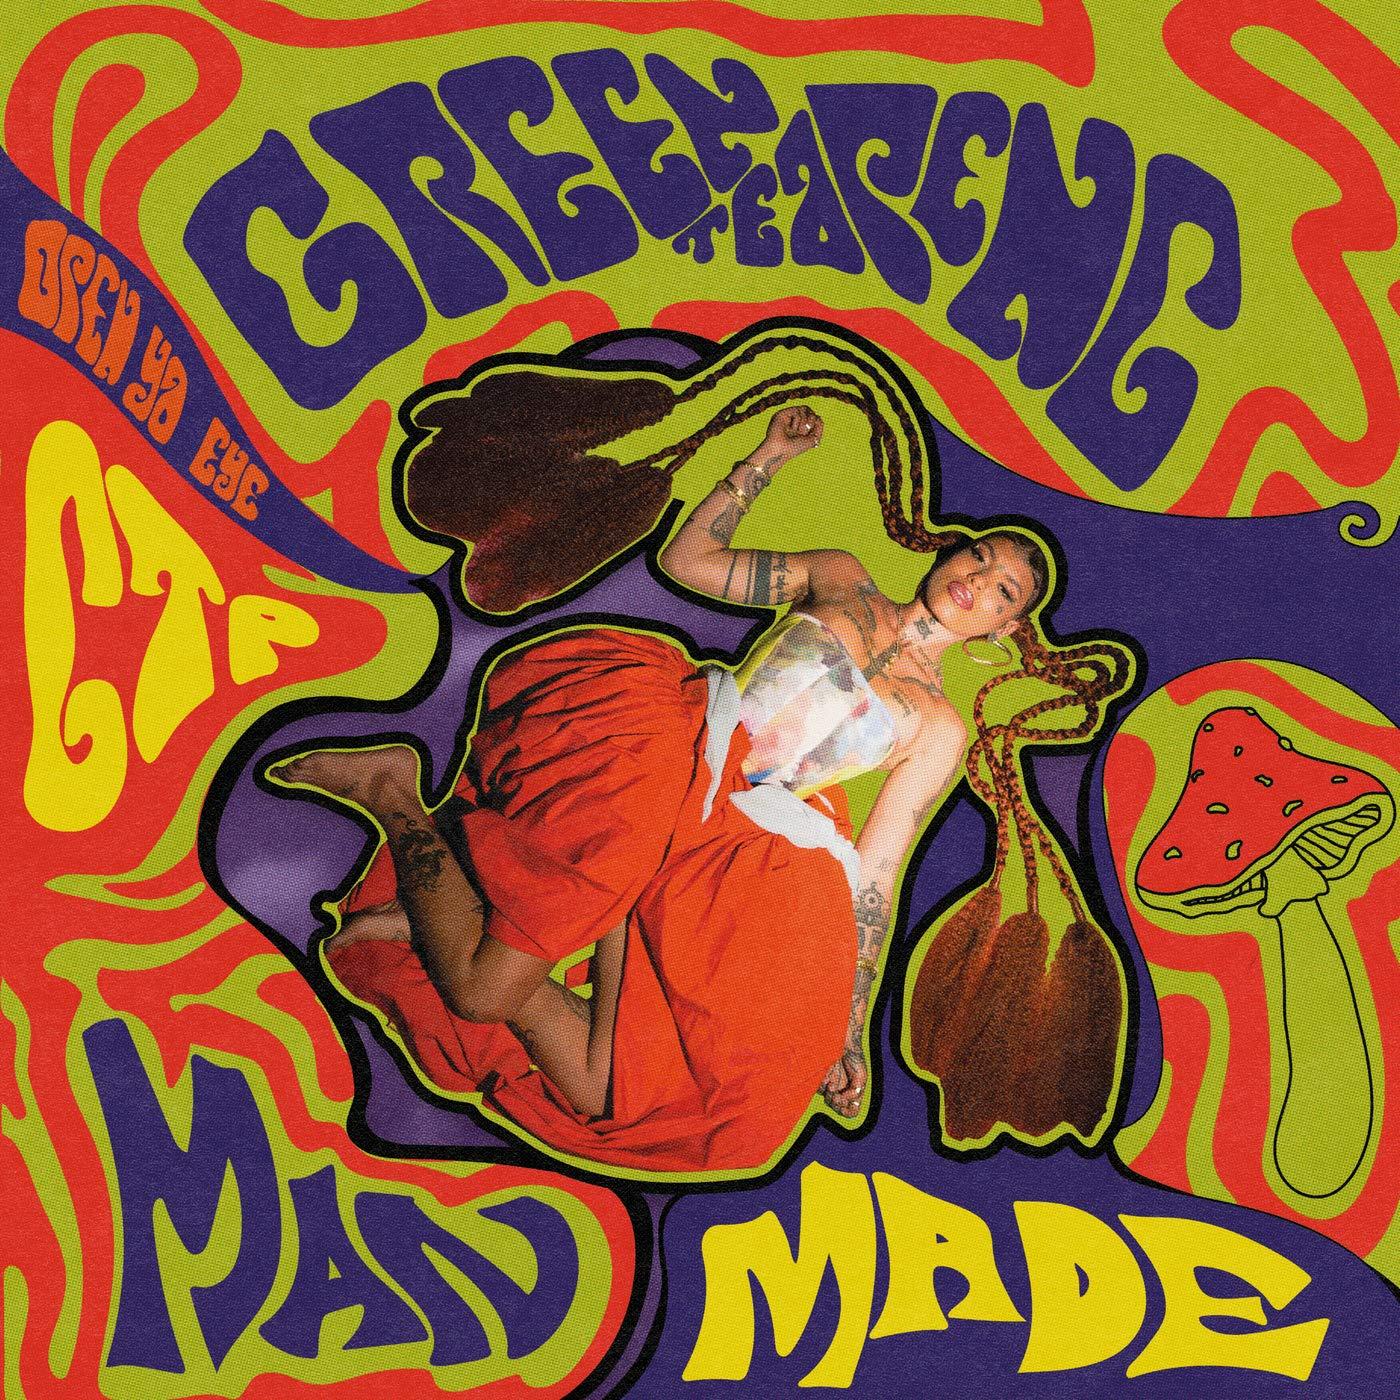 Greentea Peng - Man Made (2021) [FLAC] Download